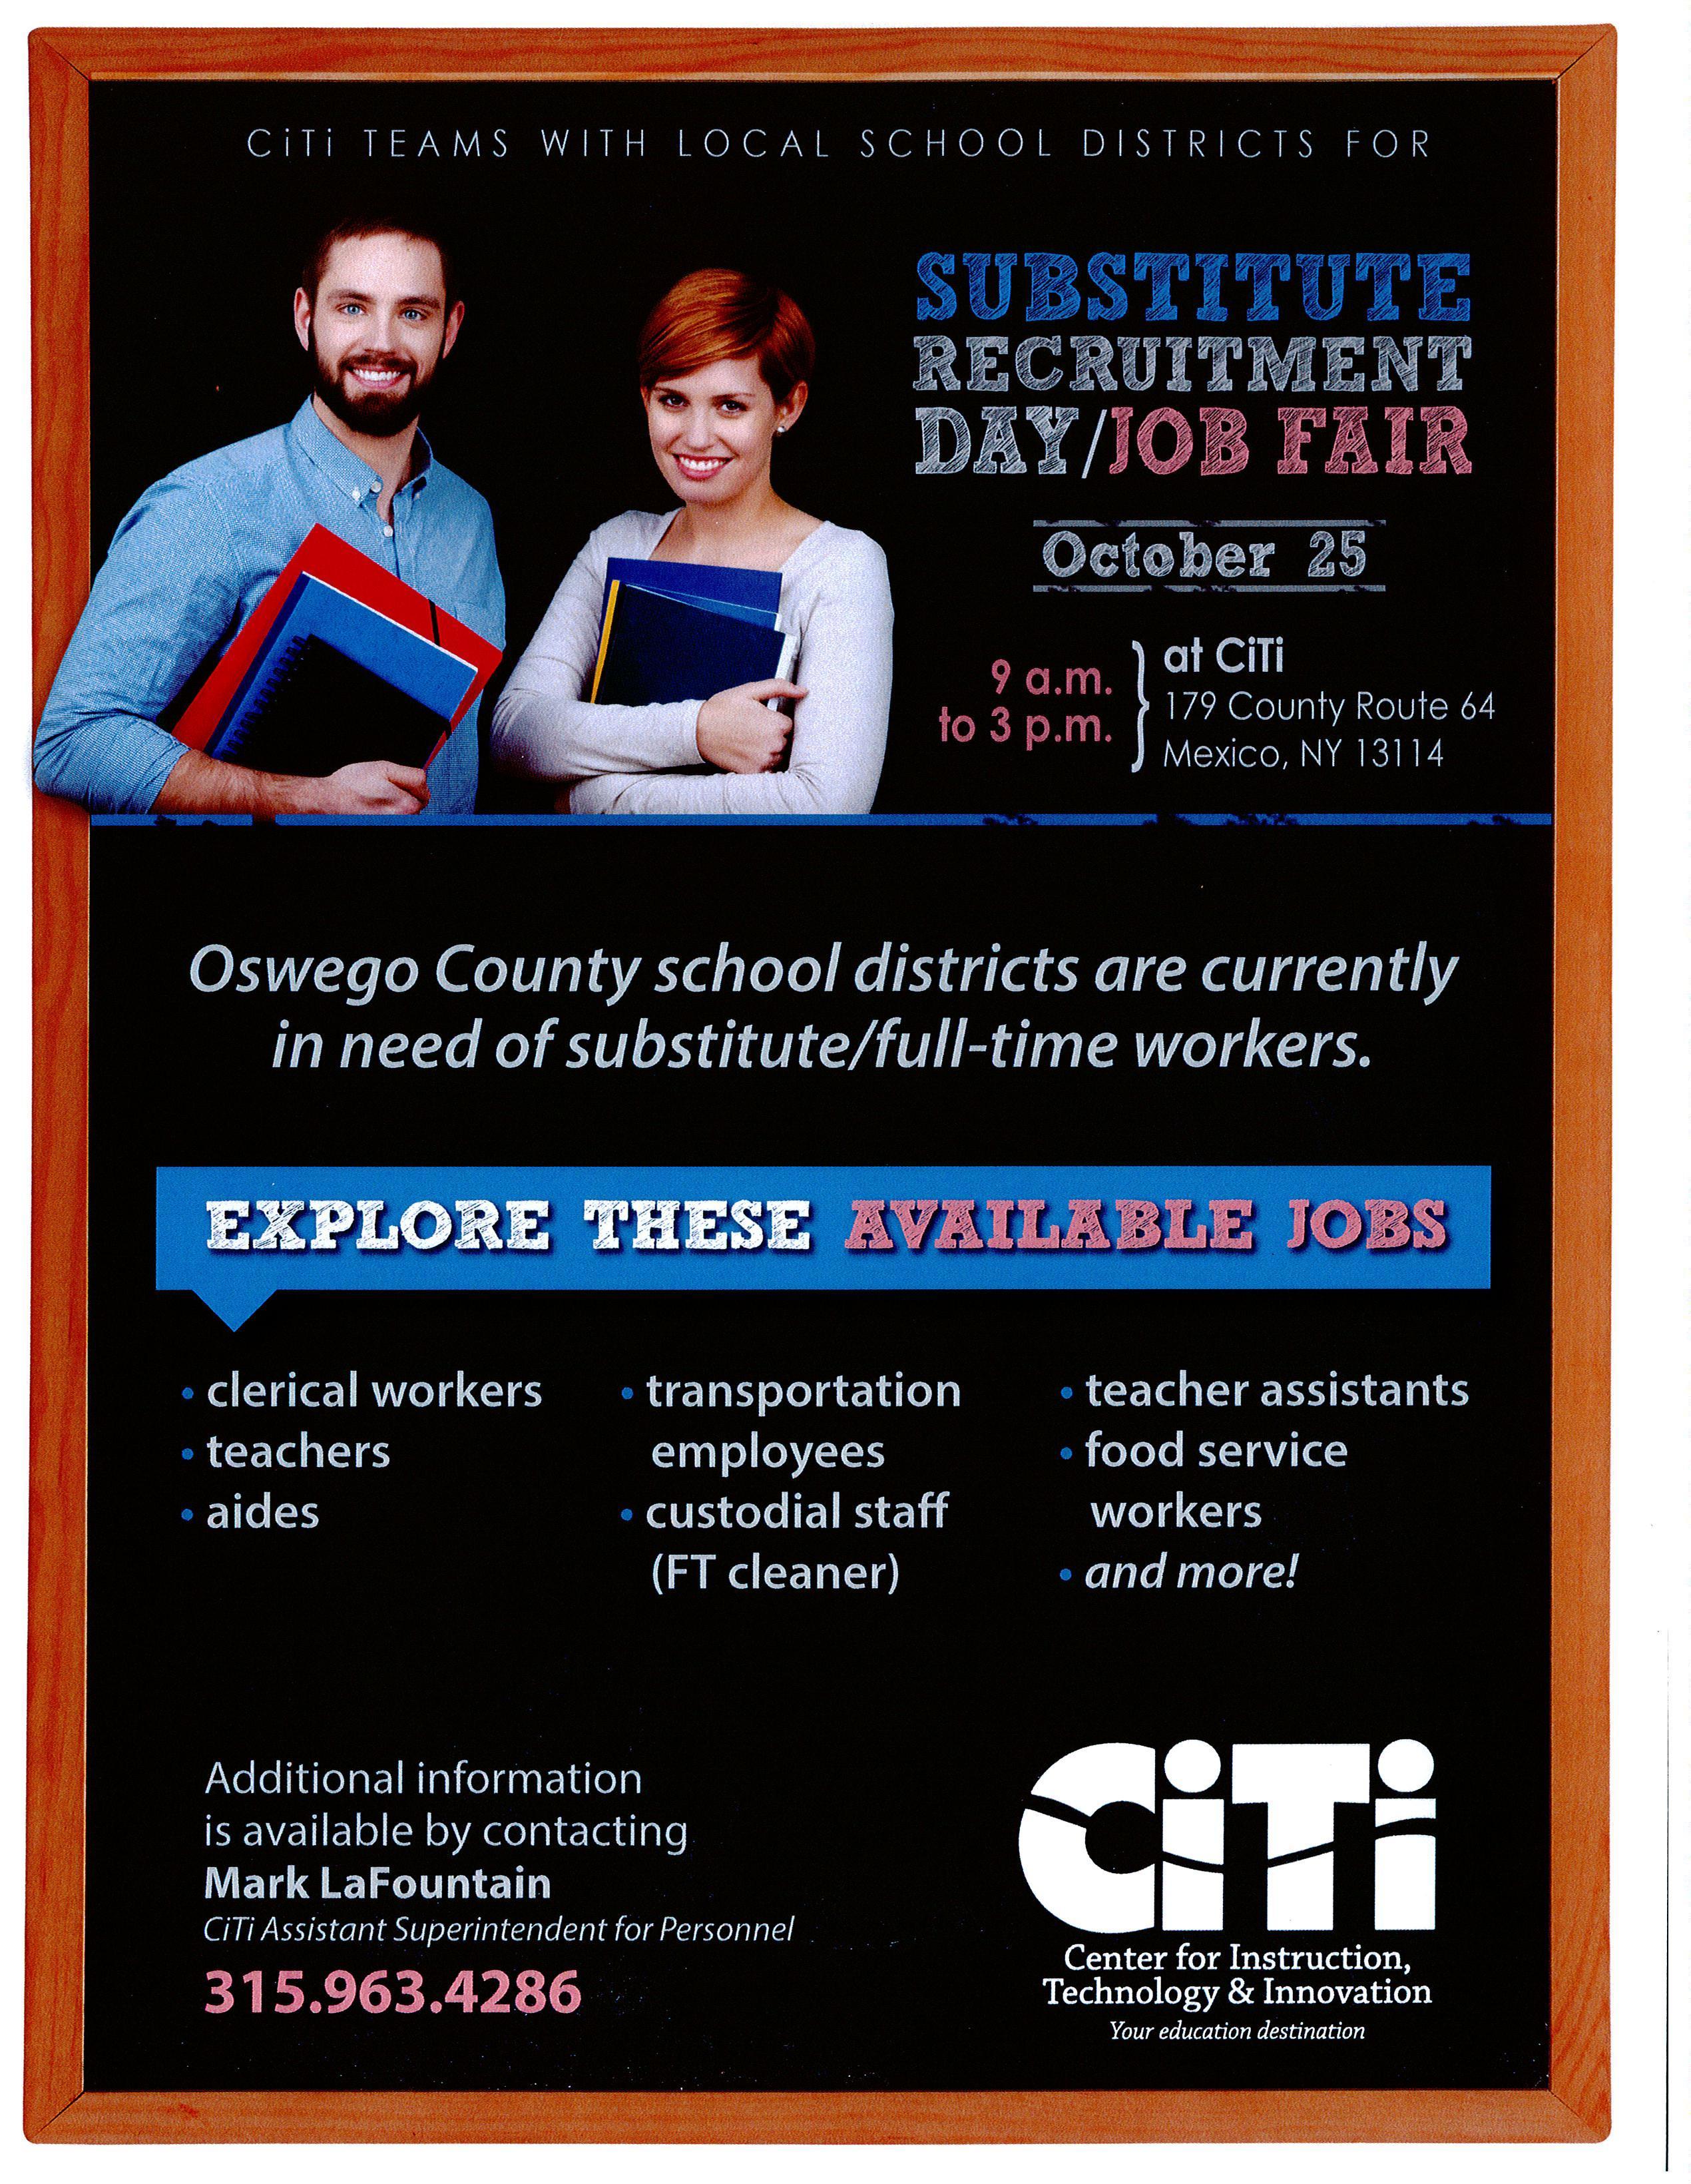 CiTi Recruitment Day - Job Fair Details